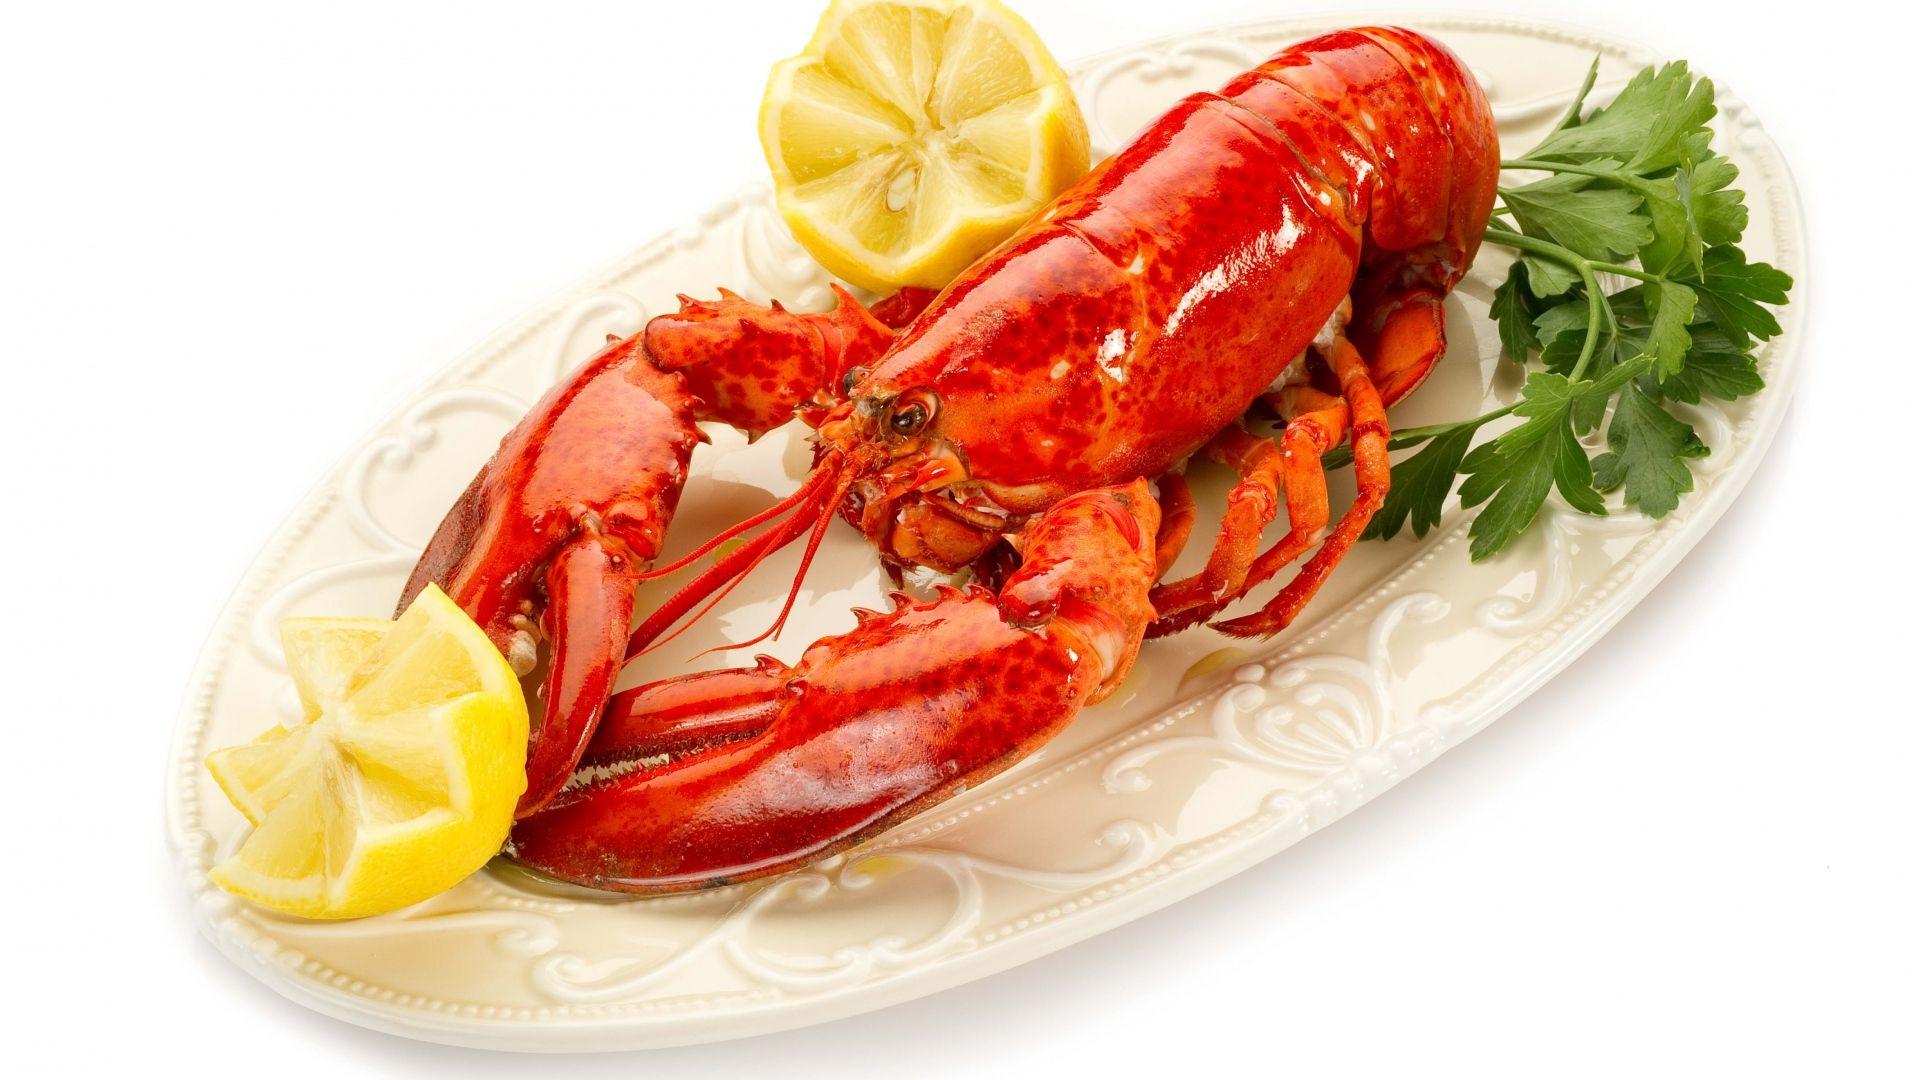 Lobster Background Wallpaper HD